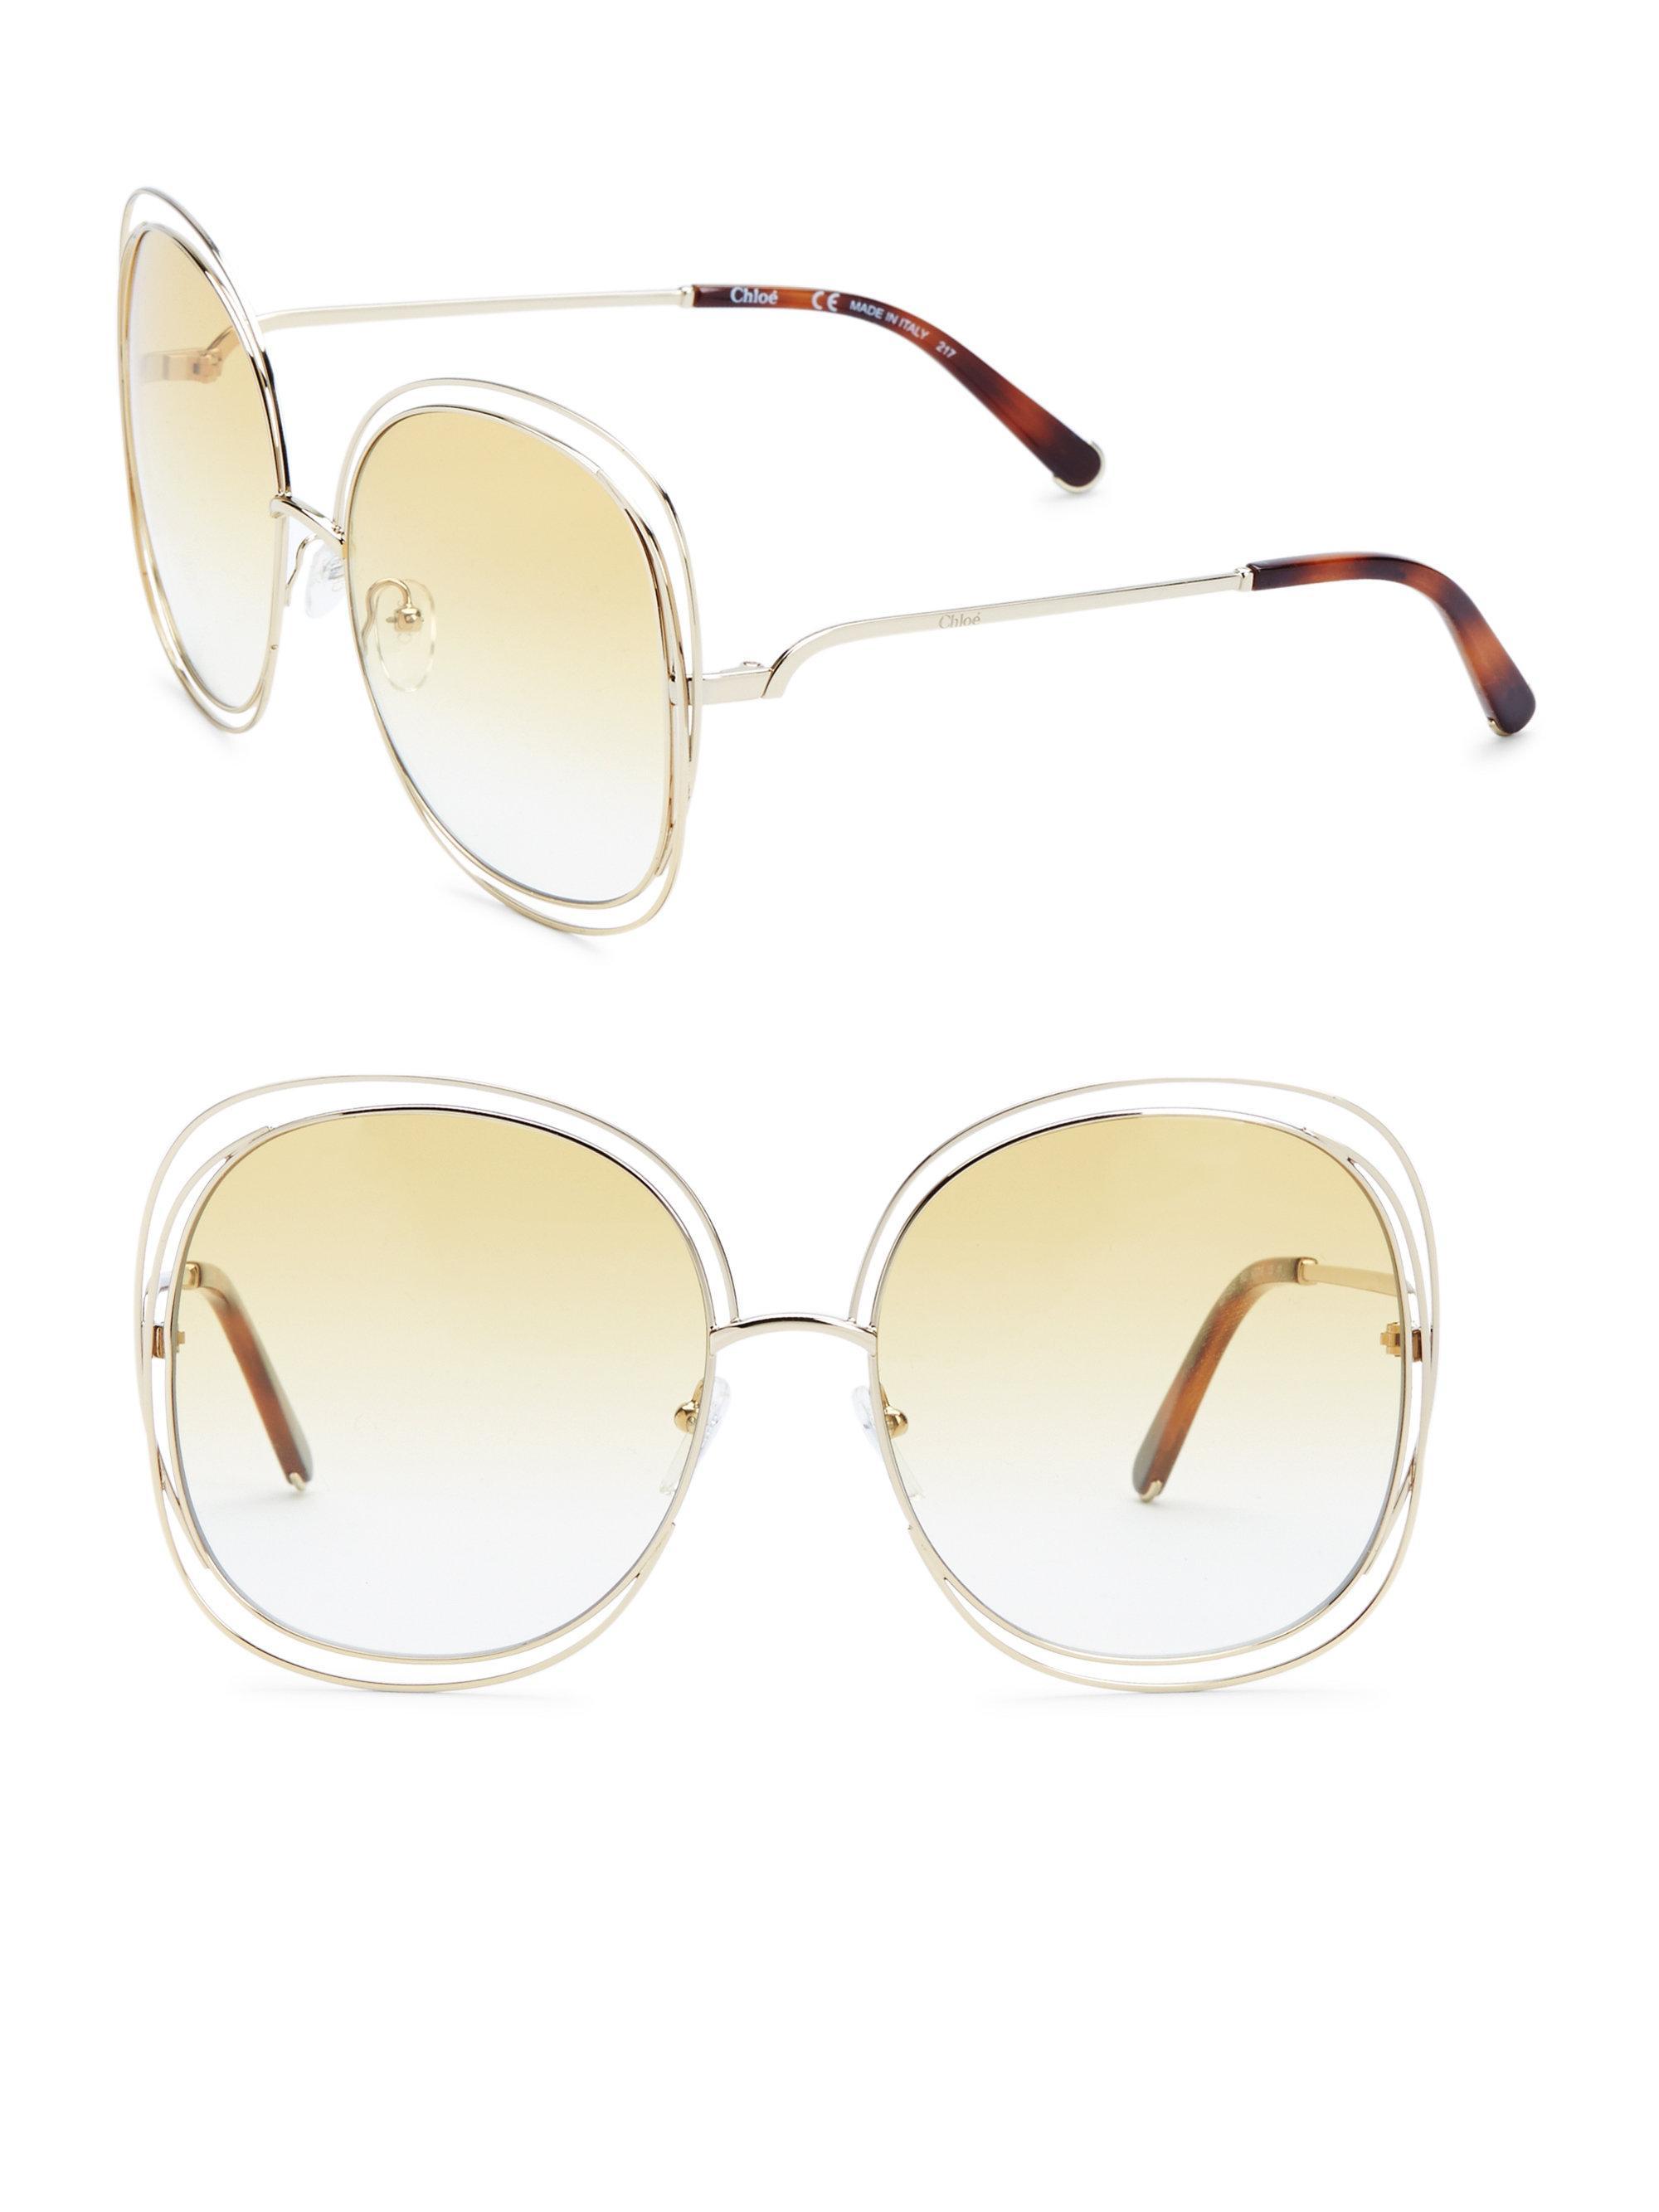 4d0808e5636 Chloé Round Sunglasses – Grey Marble « One More Soul